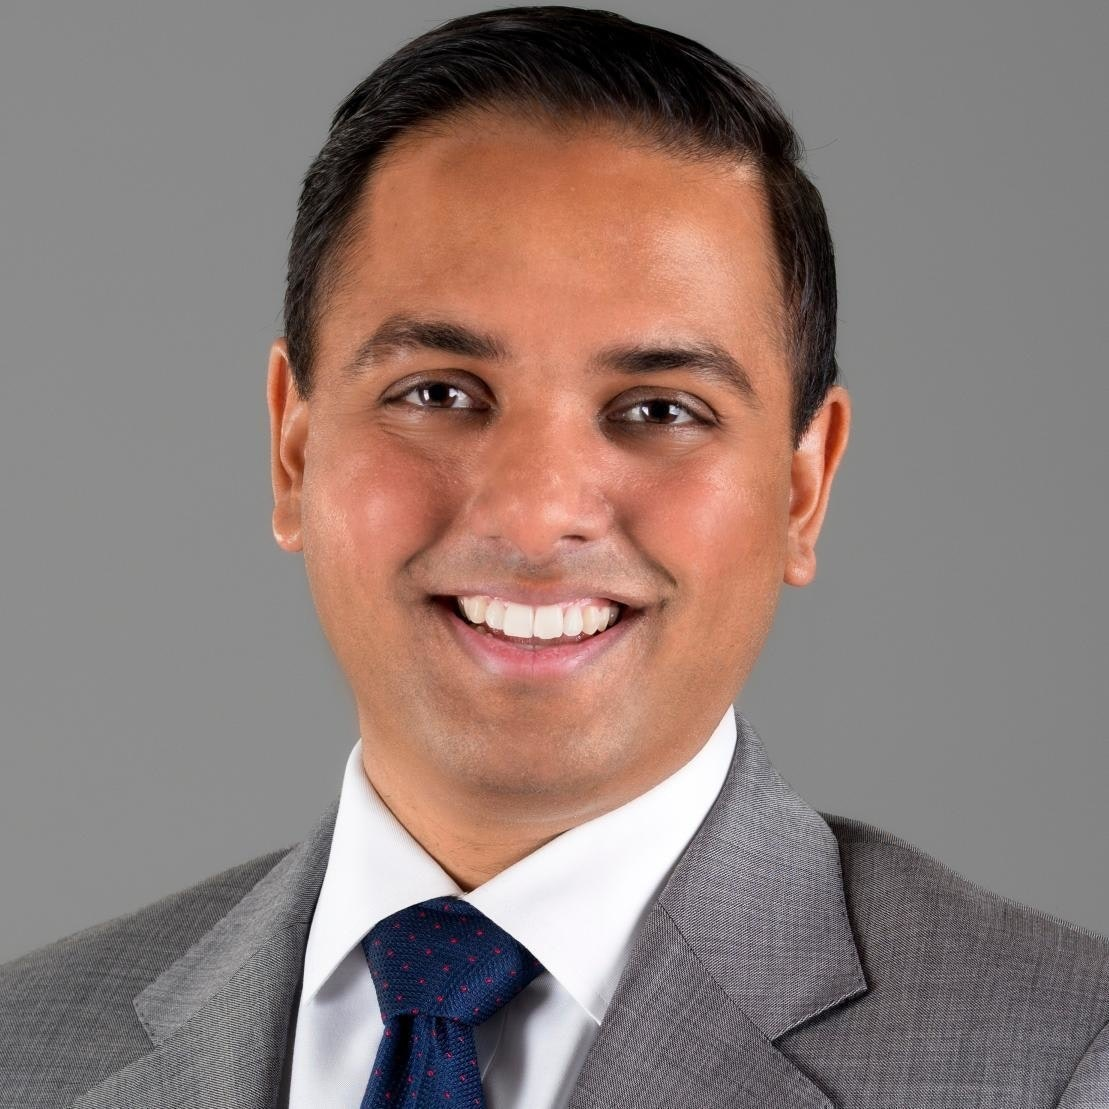 Mital M. Patel